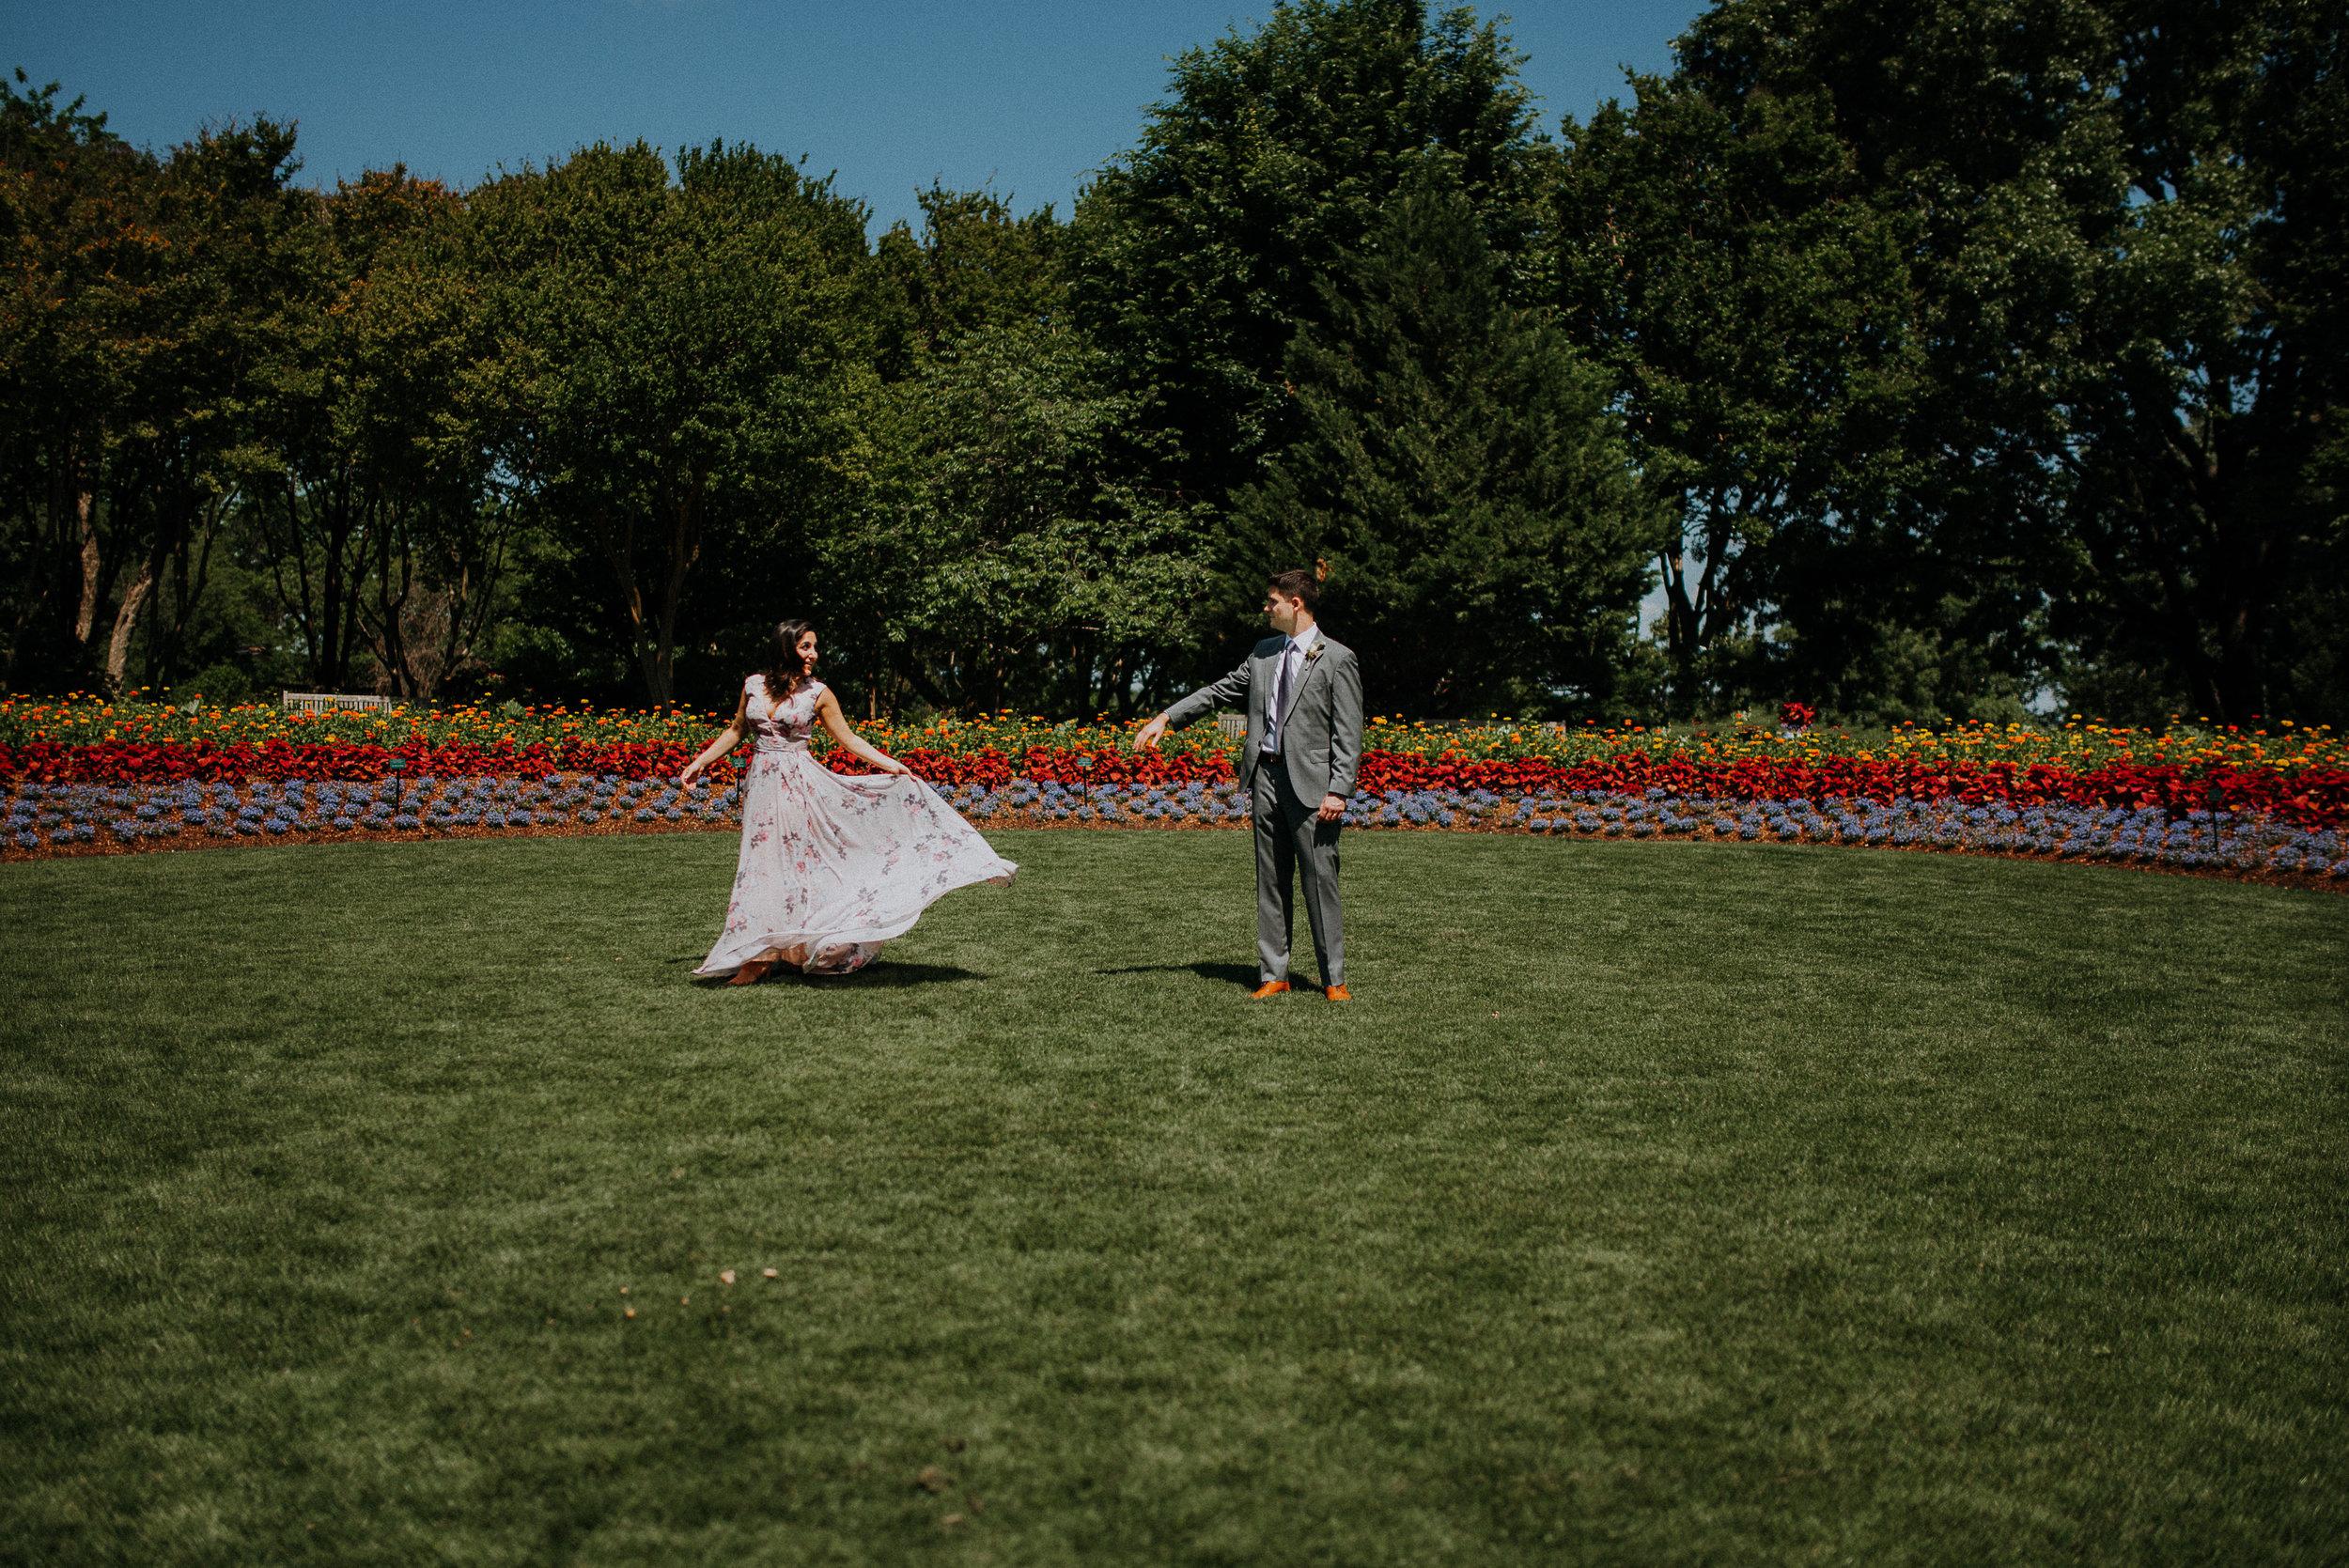 Dallas-fort-worth-wedding-photographer-dallas-arboretum-intimate-wedding-dallas-texas-33